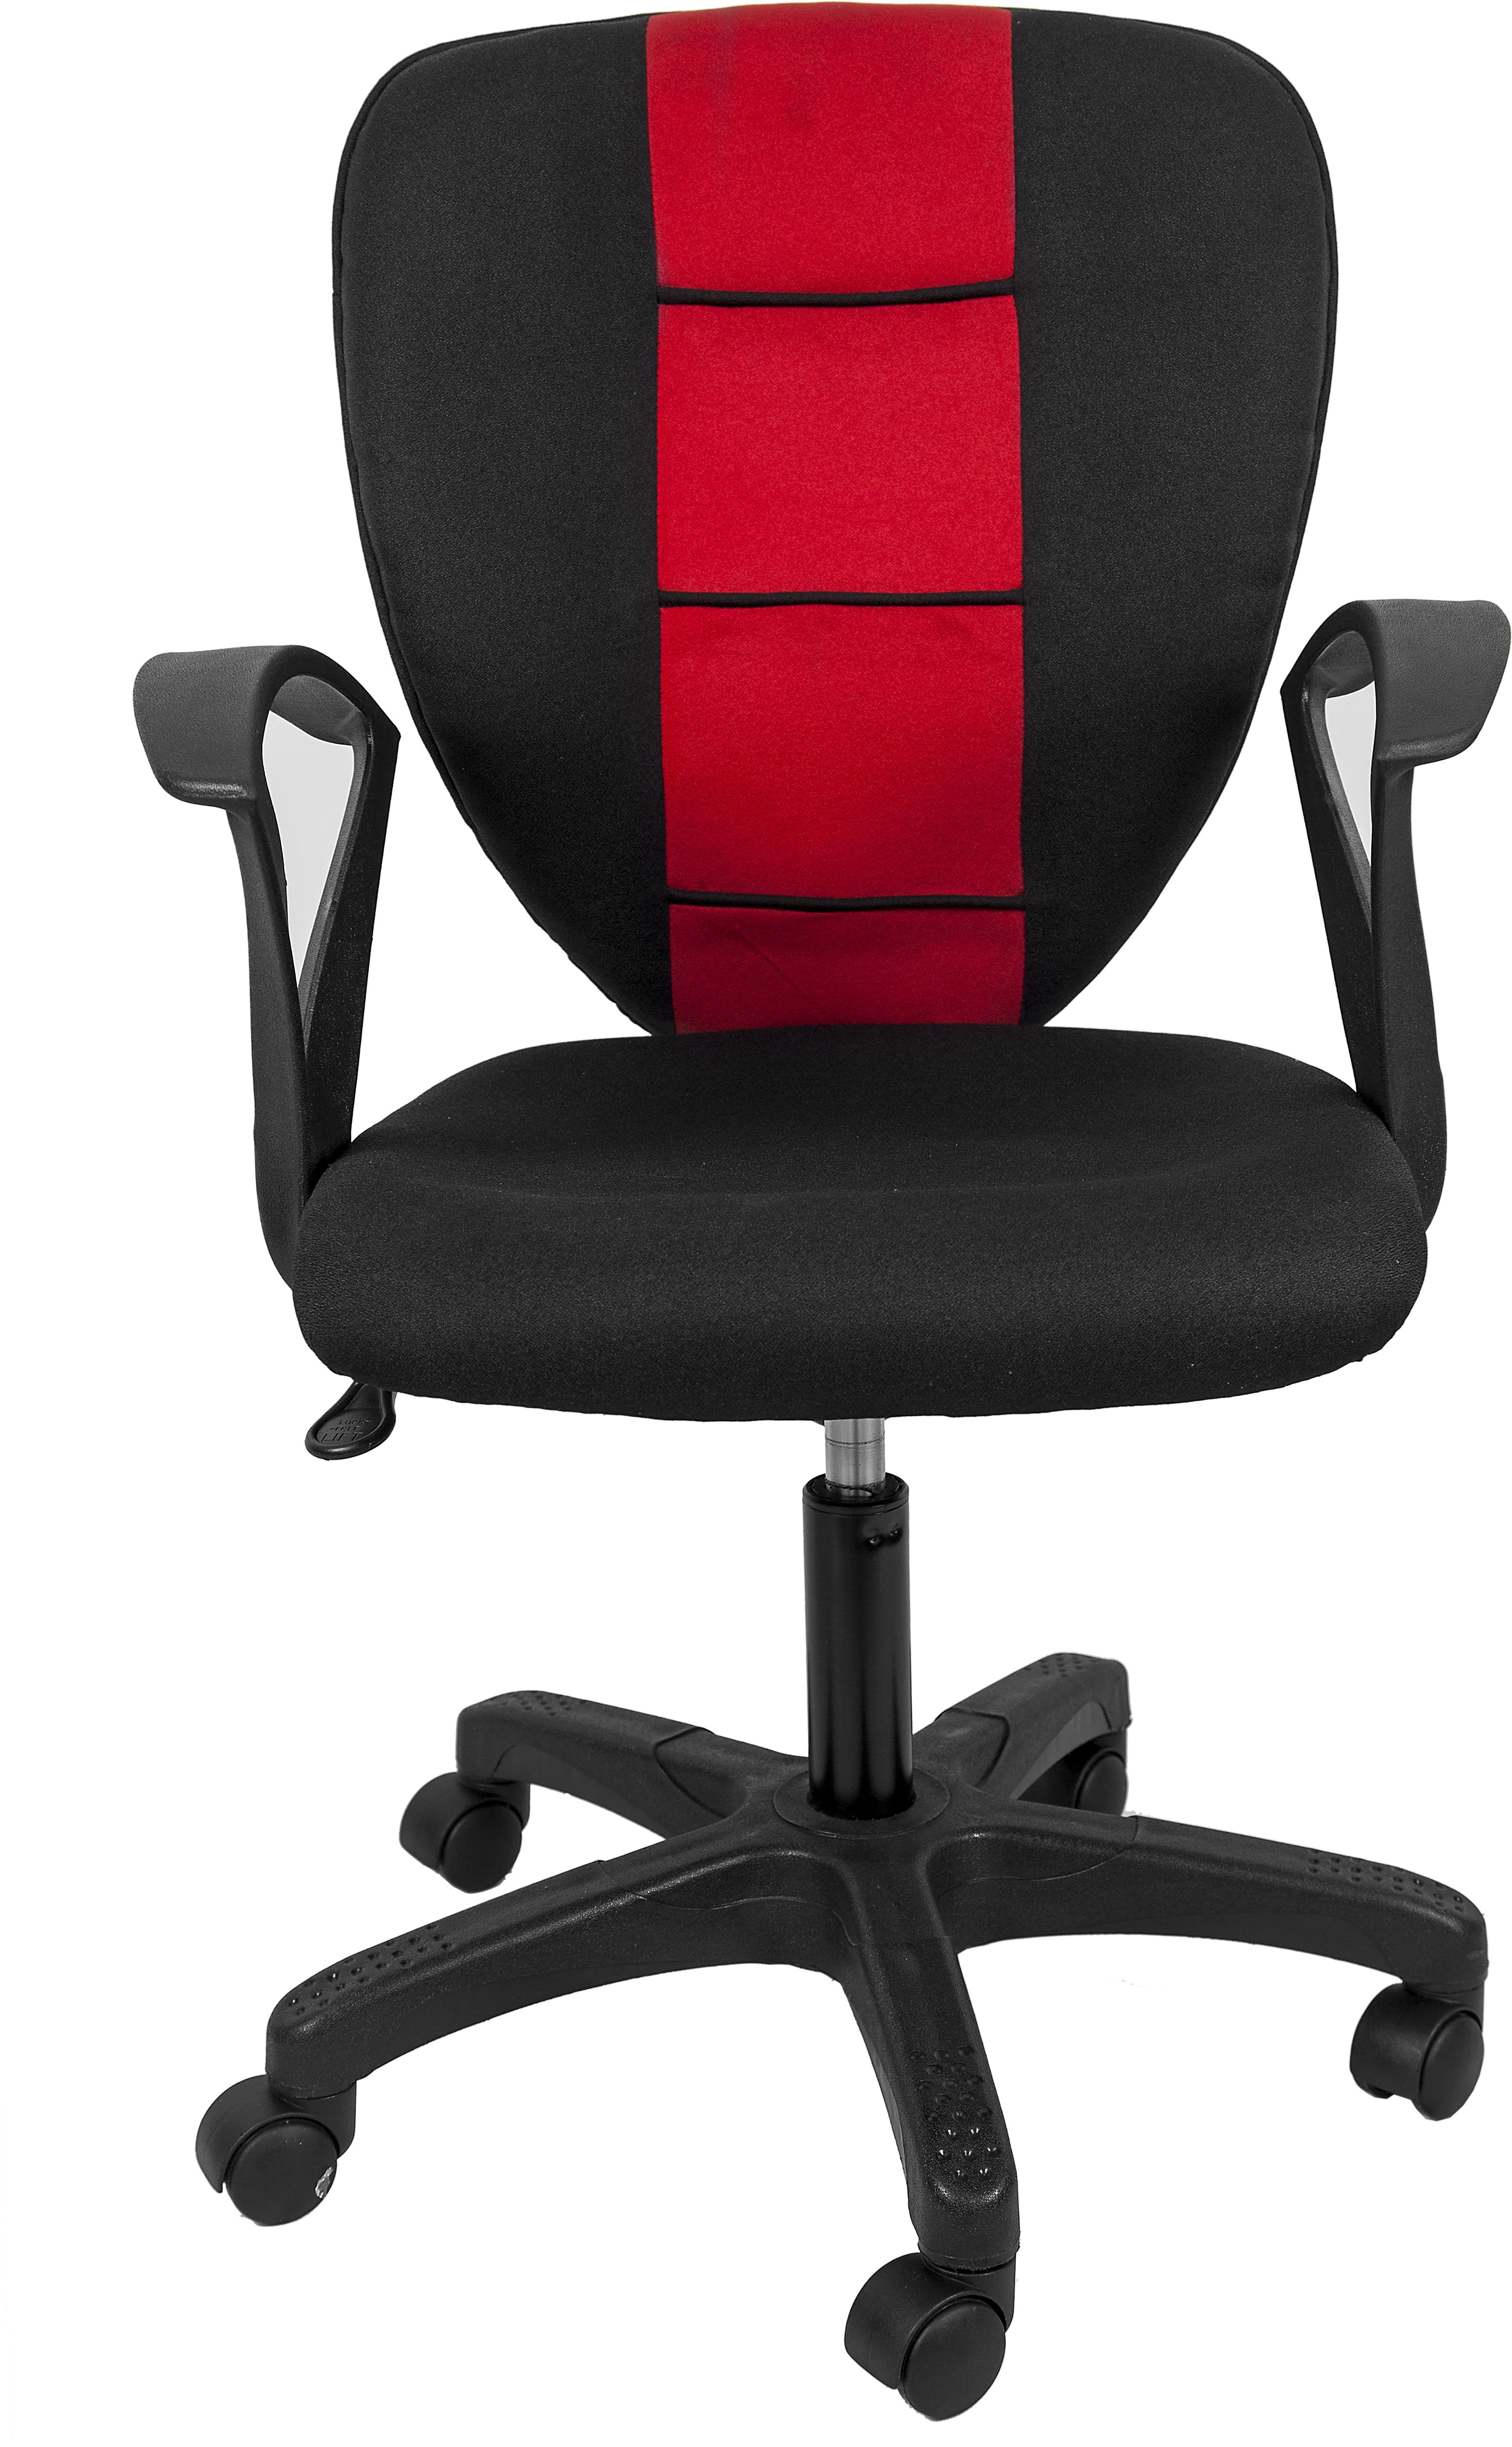 View Hetal Enterprises Fabric Office Chair(Red, Black) Furniture (Hetal Enterprises)